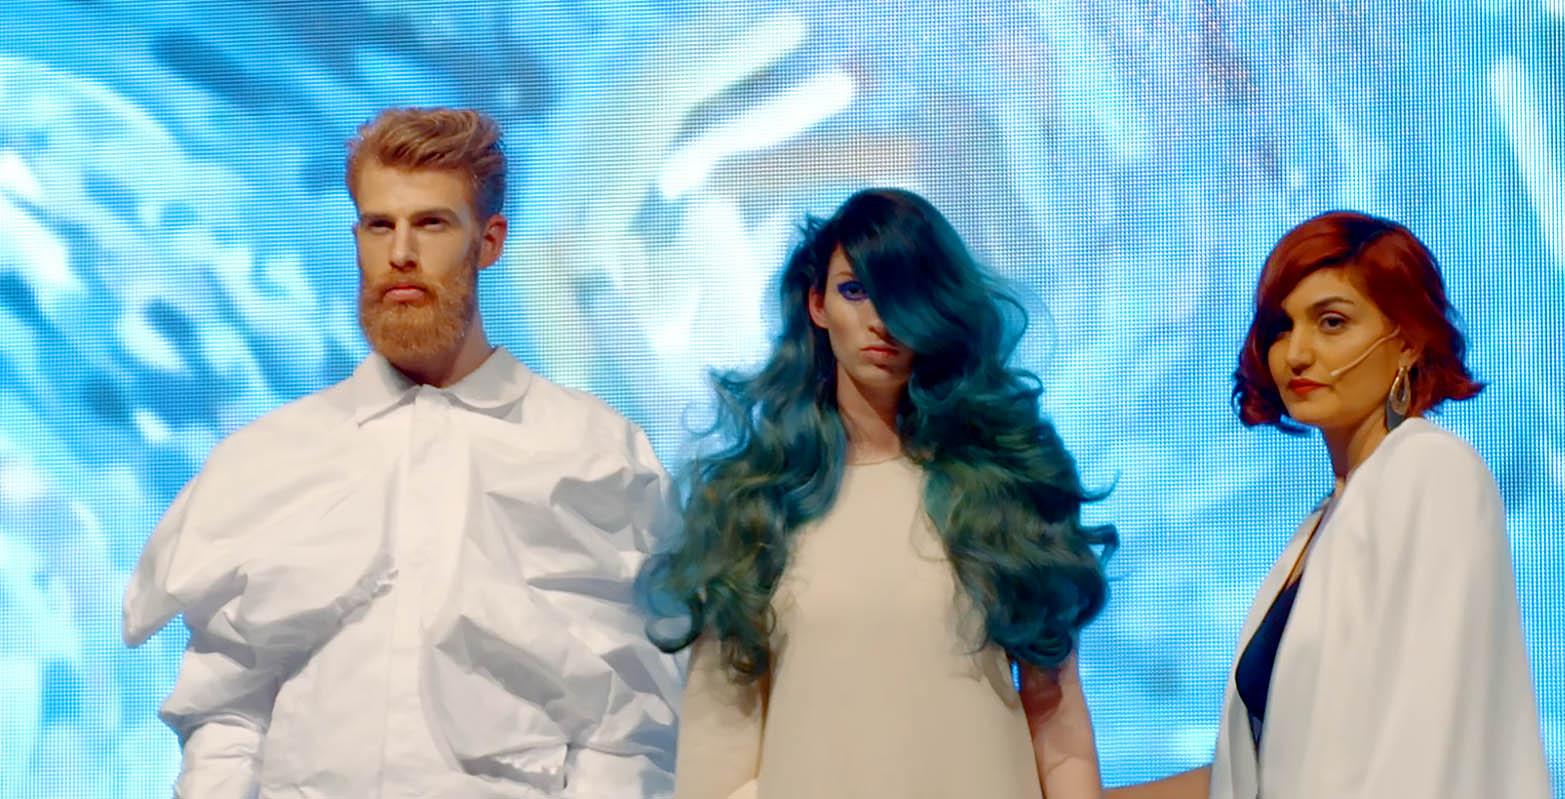 Team of Sevda Durukan promoted by JOYCO winner of the hair games , brussel filmed by Jason Berkley Studios Van Gogh Style modelling and catwalking